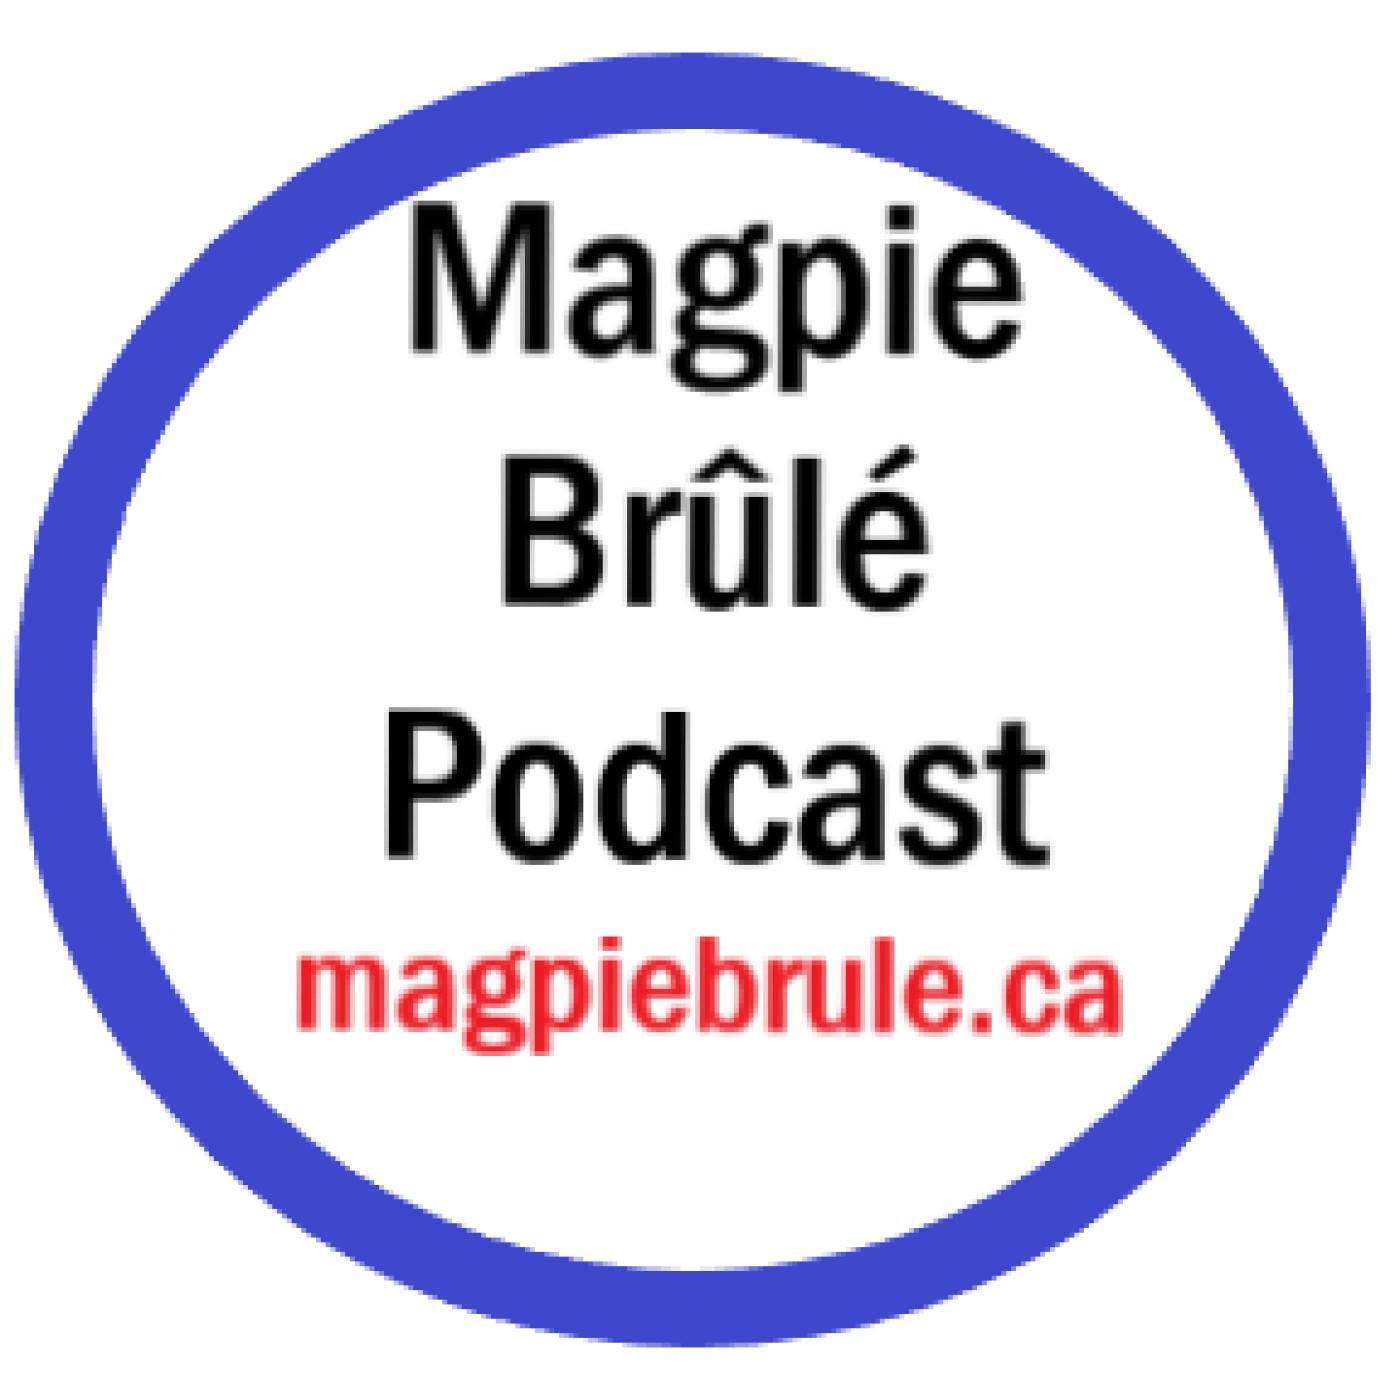 Magpie Brûlé show art